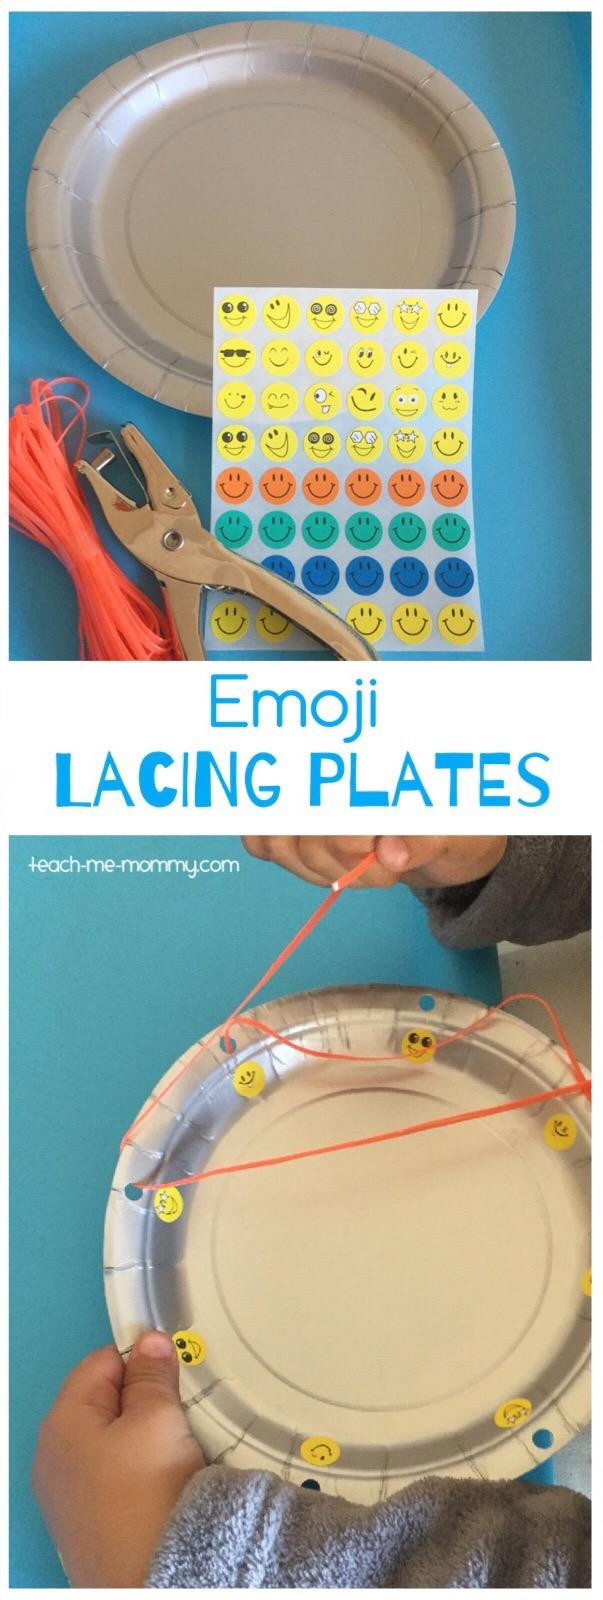 emoji lacing plates